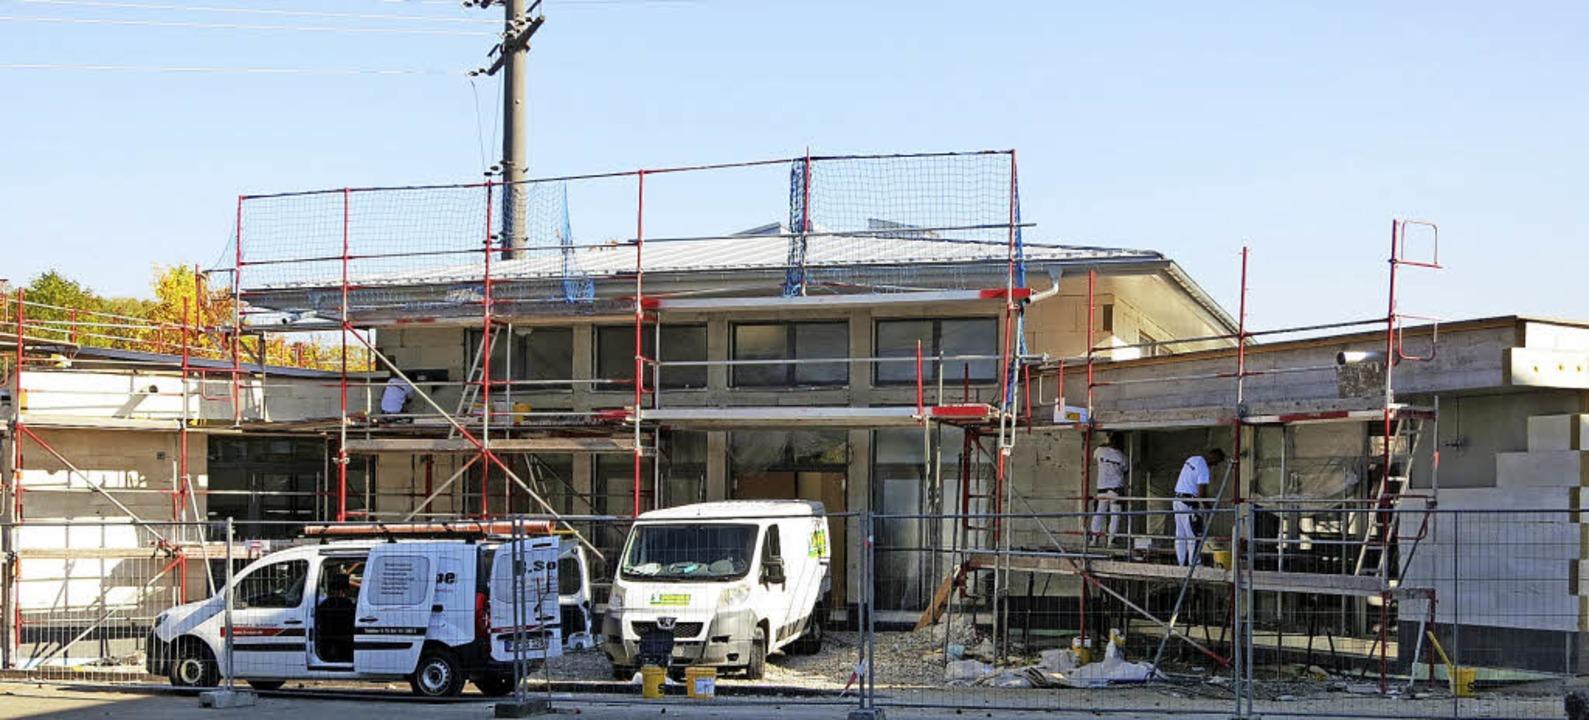 Bauarbeiten an neuer Mensa Hebelschule Schliengen  | Foto: Michael Behrendt